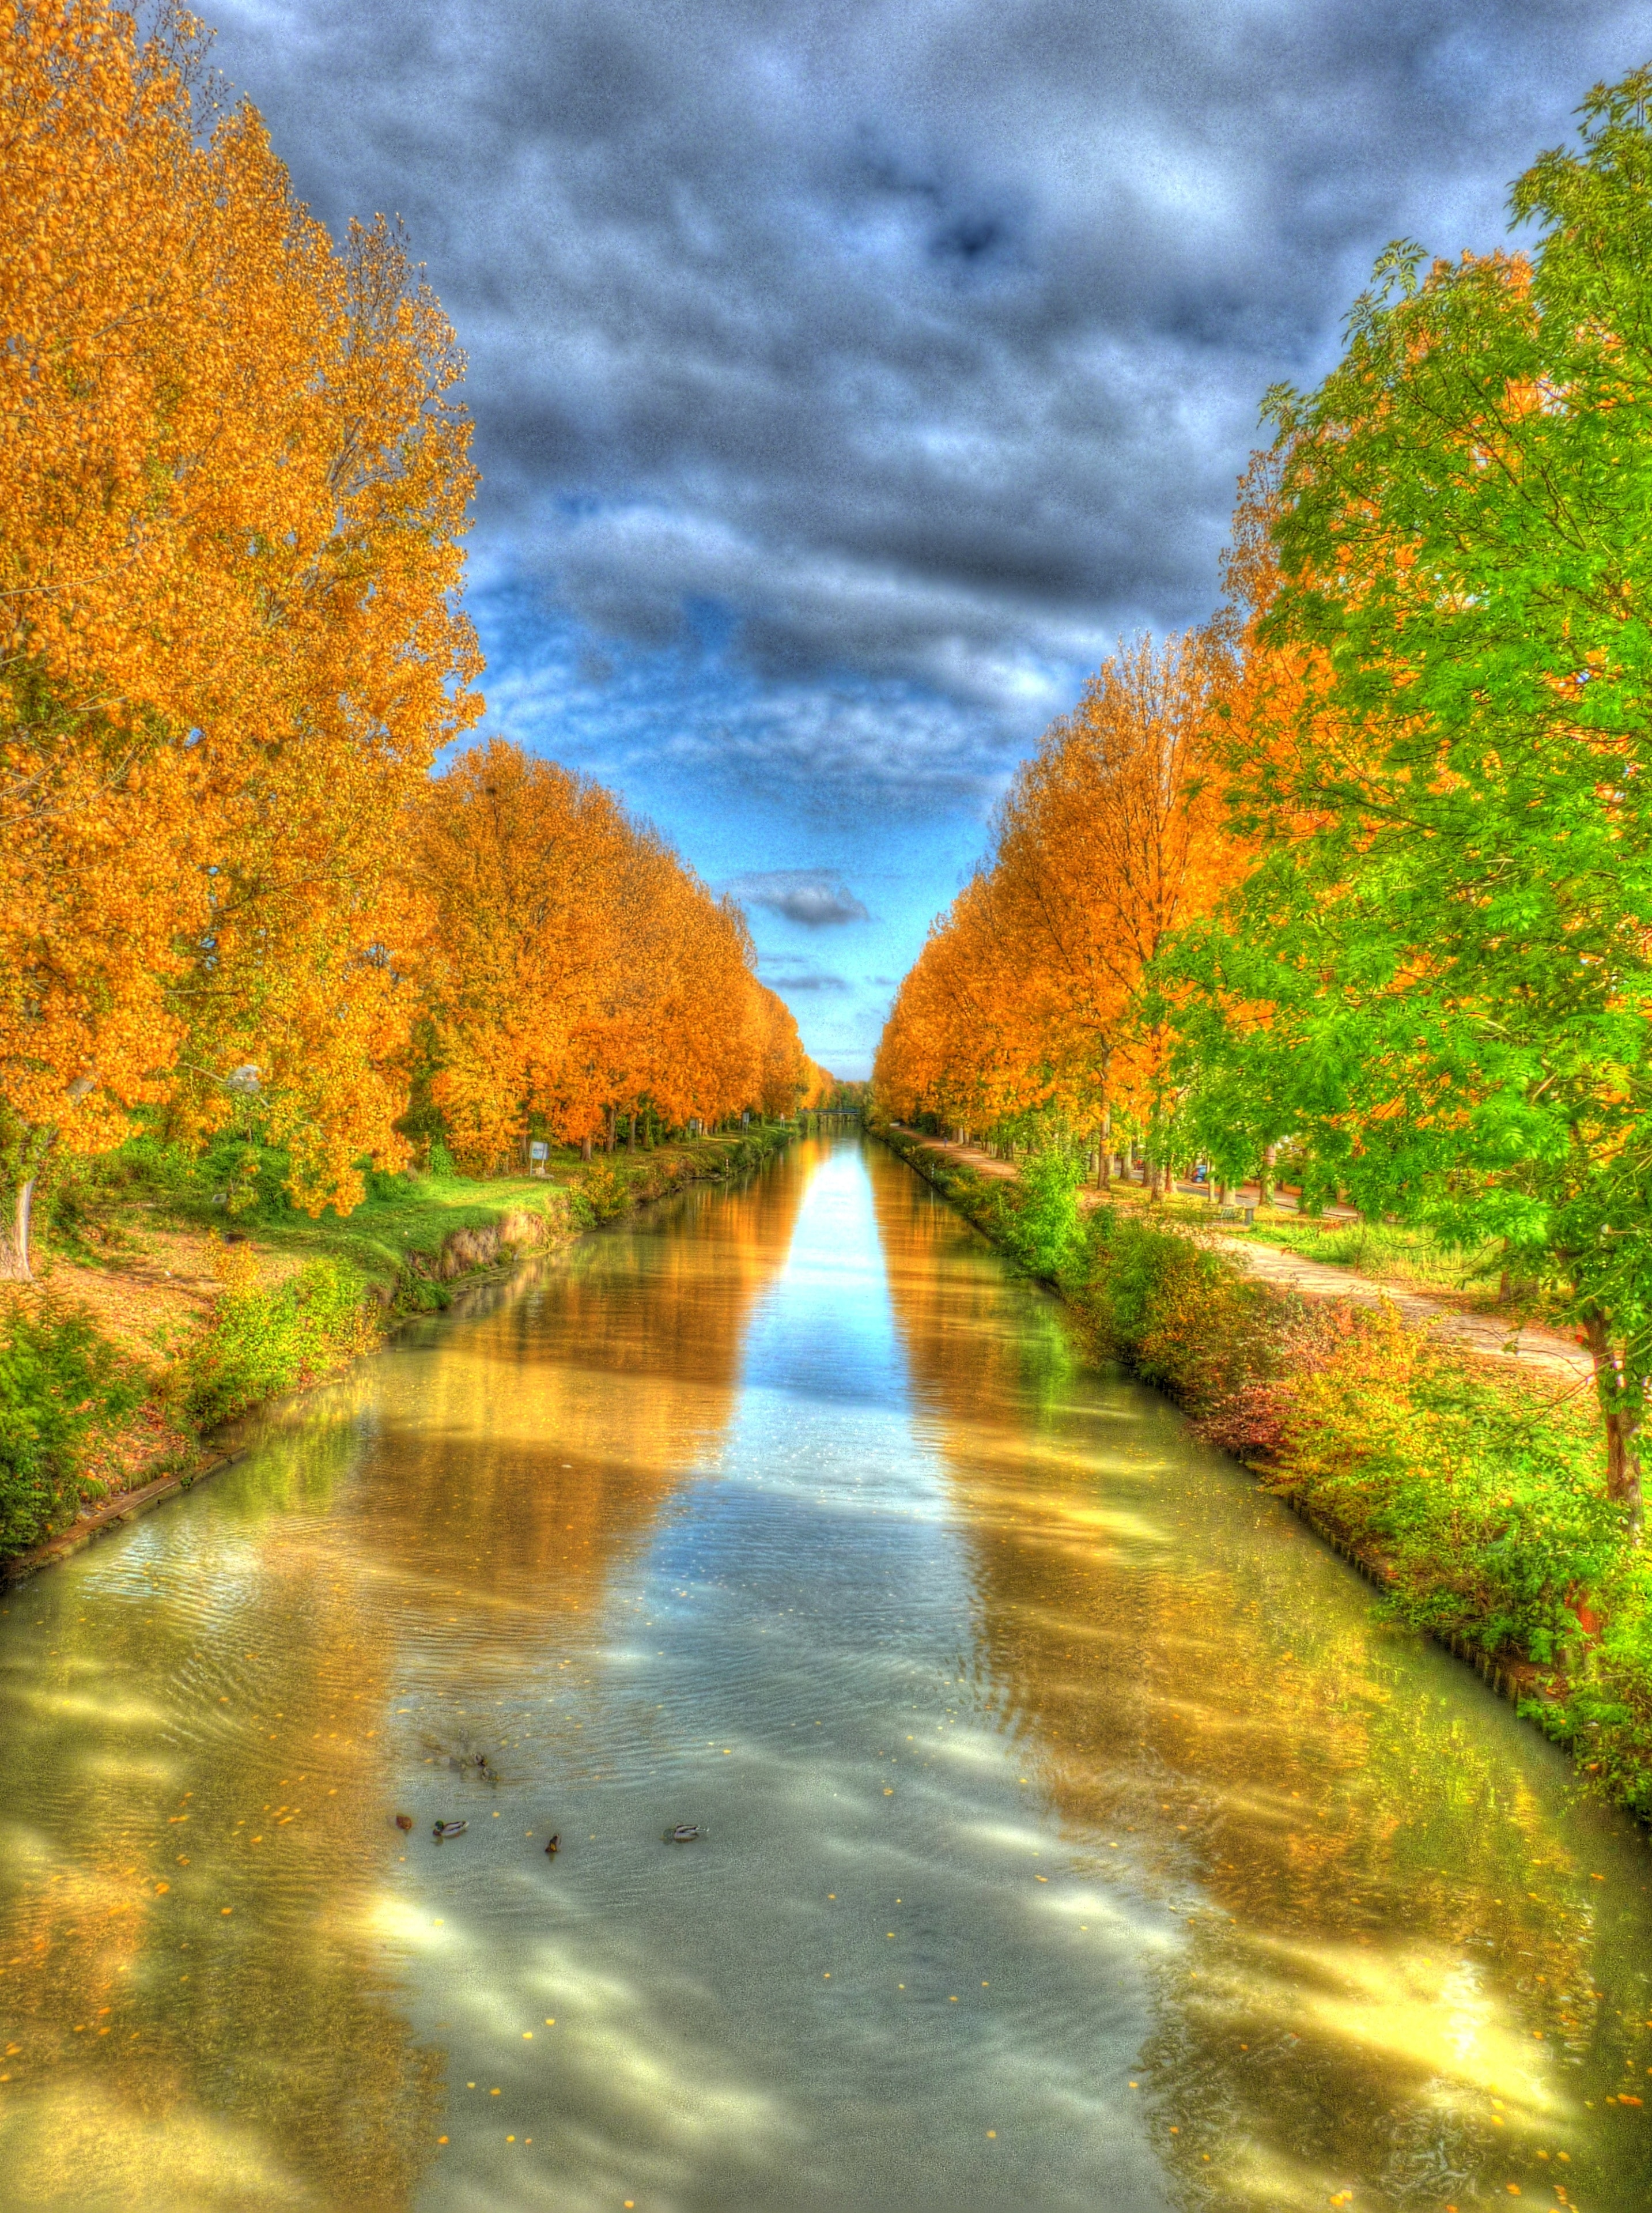 Chelles, Seine-et-Marne (departamento), França